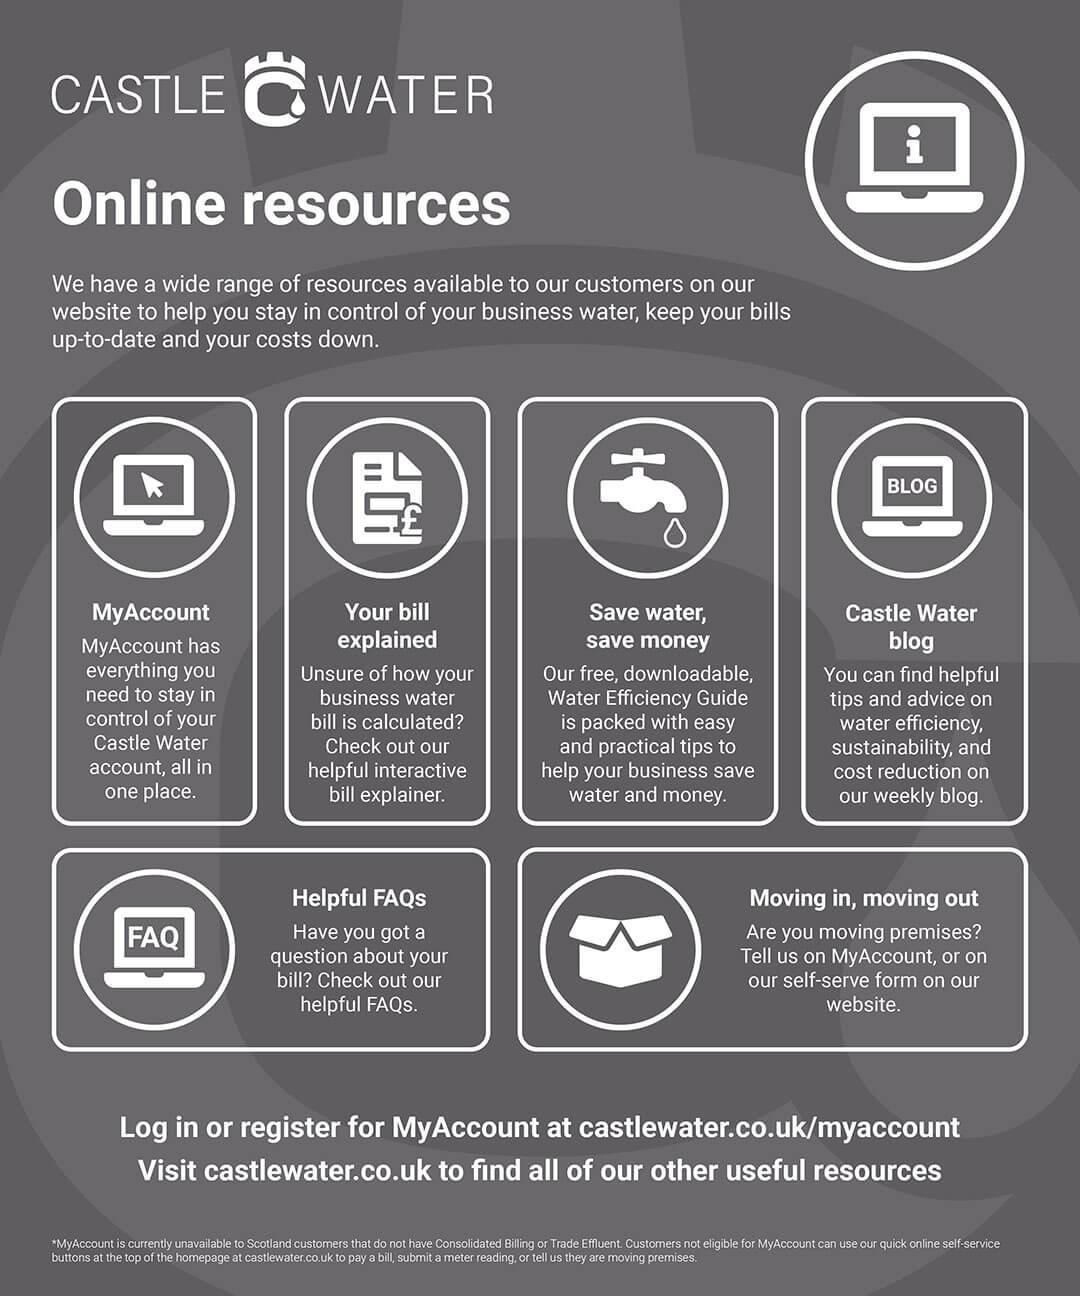 Online resources infographic